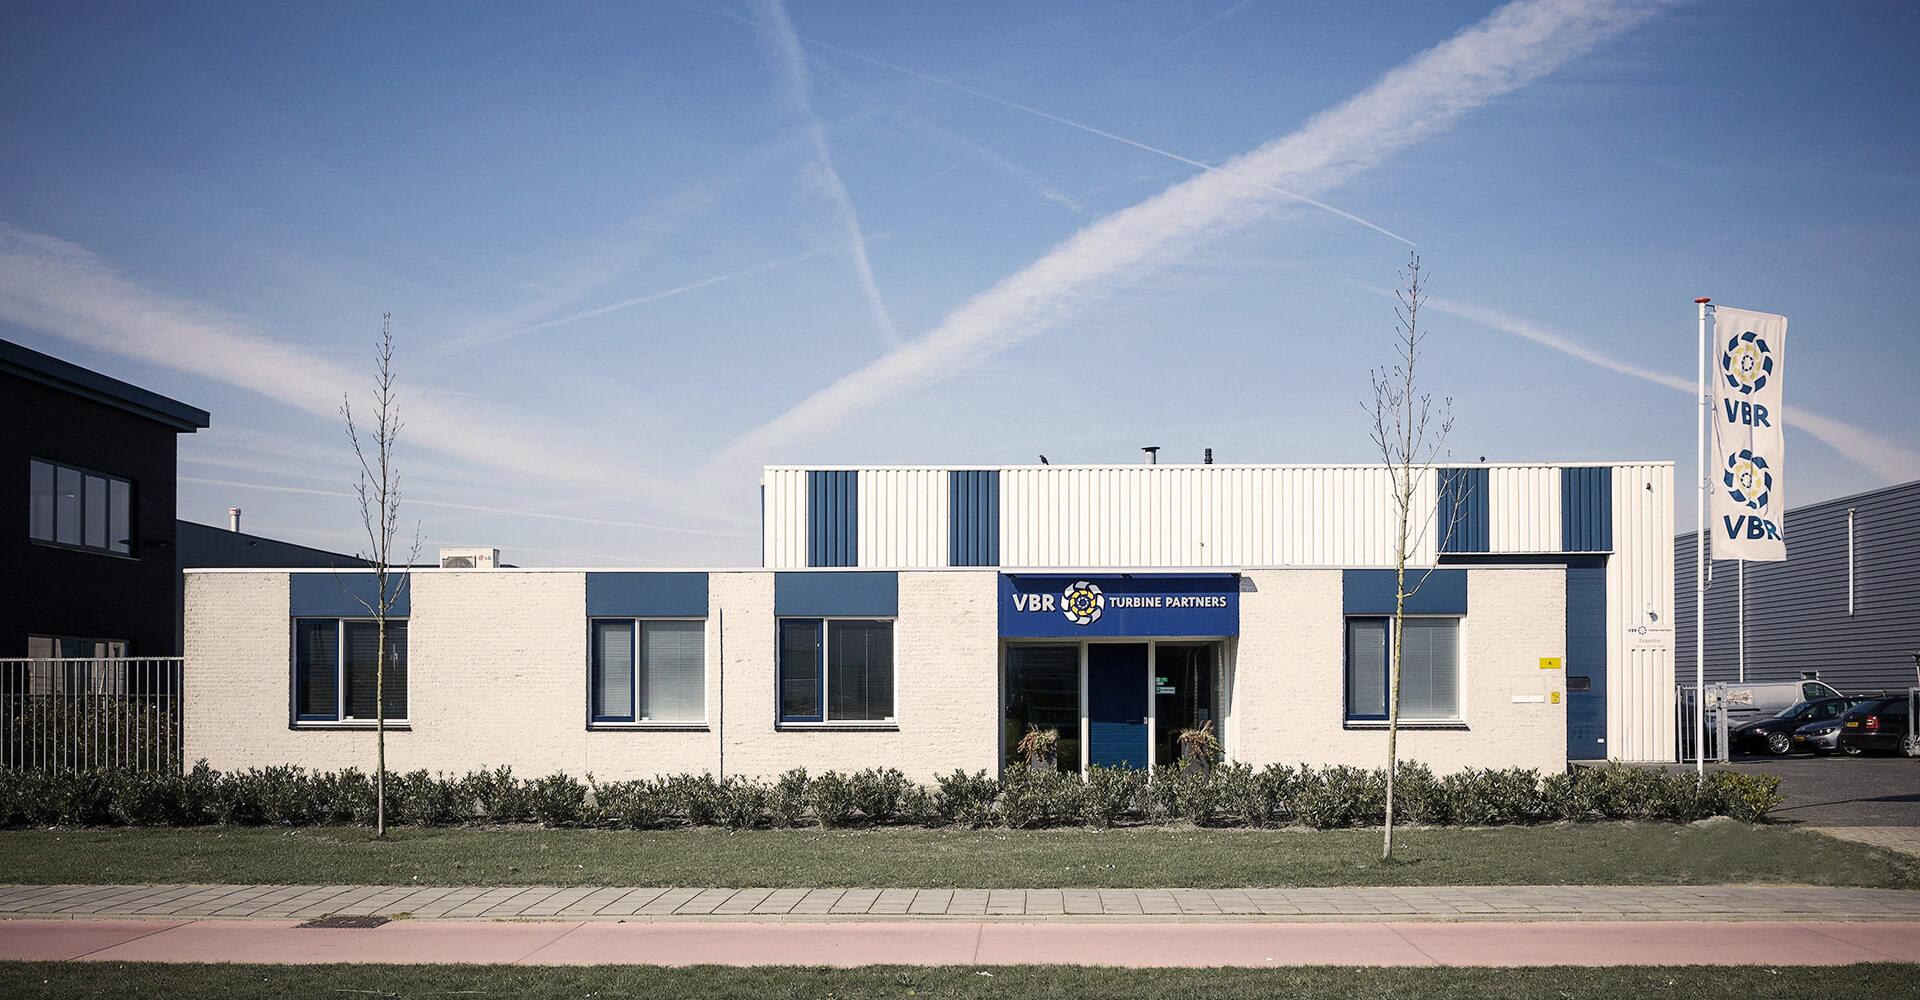 VBR HQ - Industrieweg Oost 6 - Elst - Netherlands